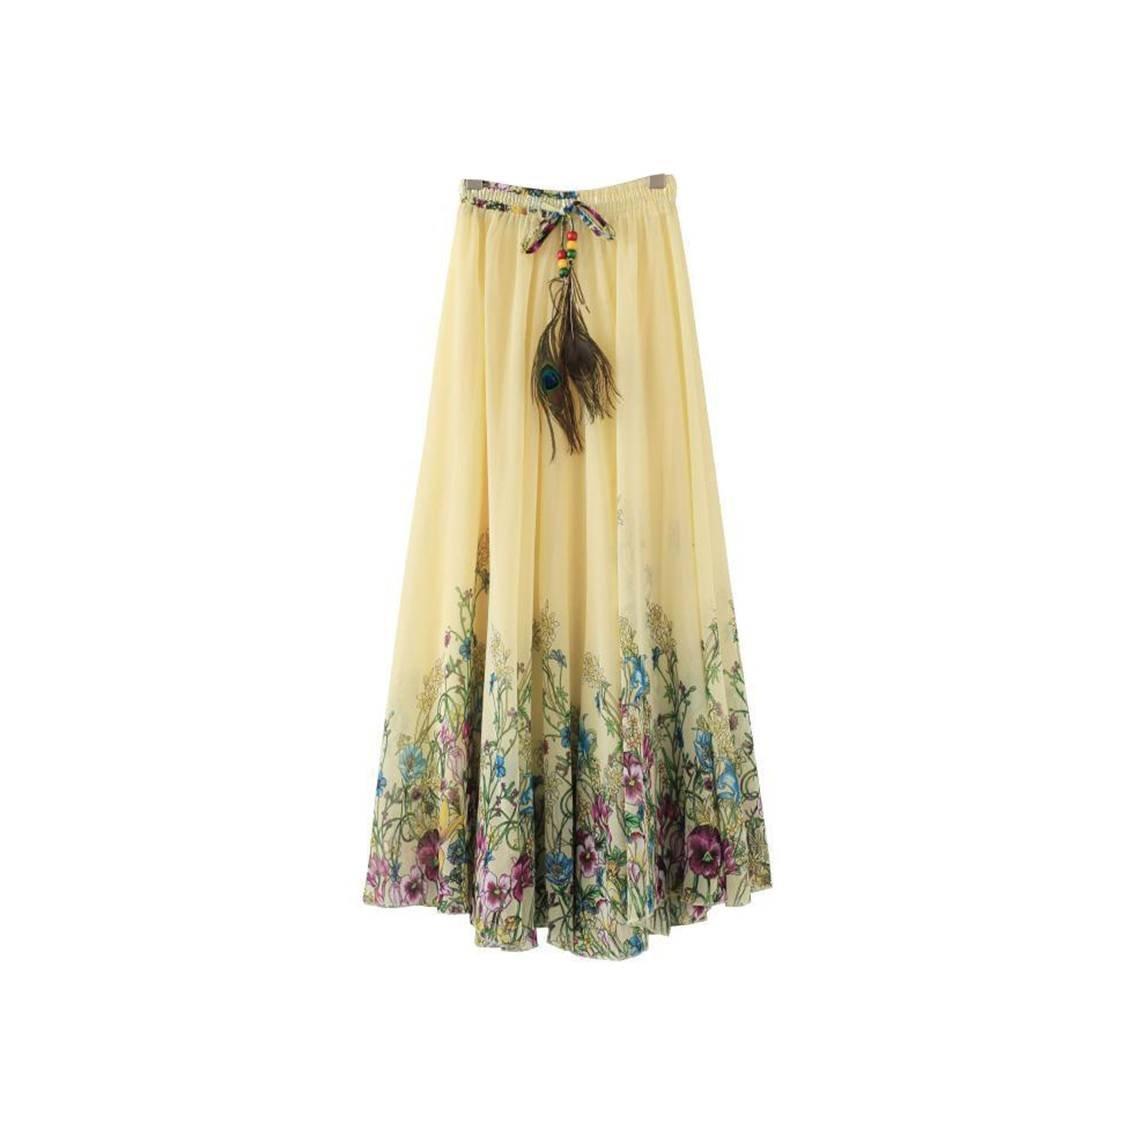 Kaxuyiiy Women's Casual Beach Peacock Feather Maxi Long Pleated Skirt